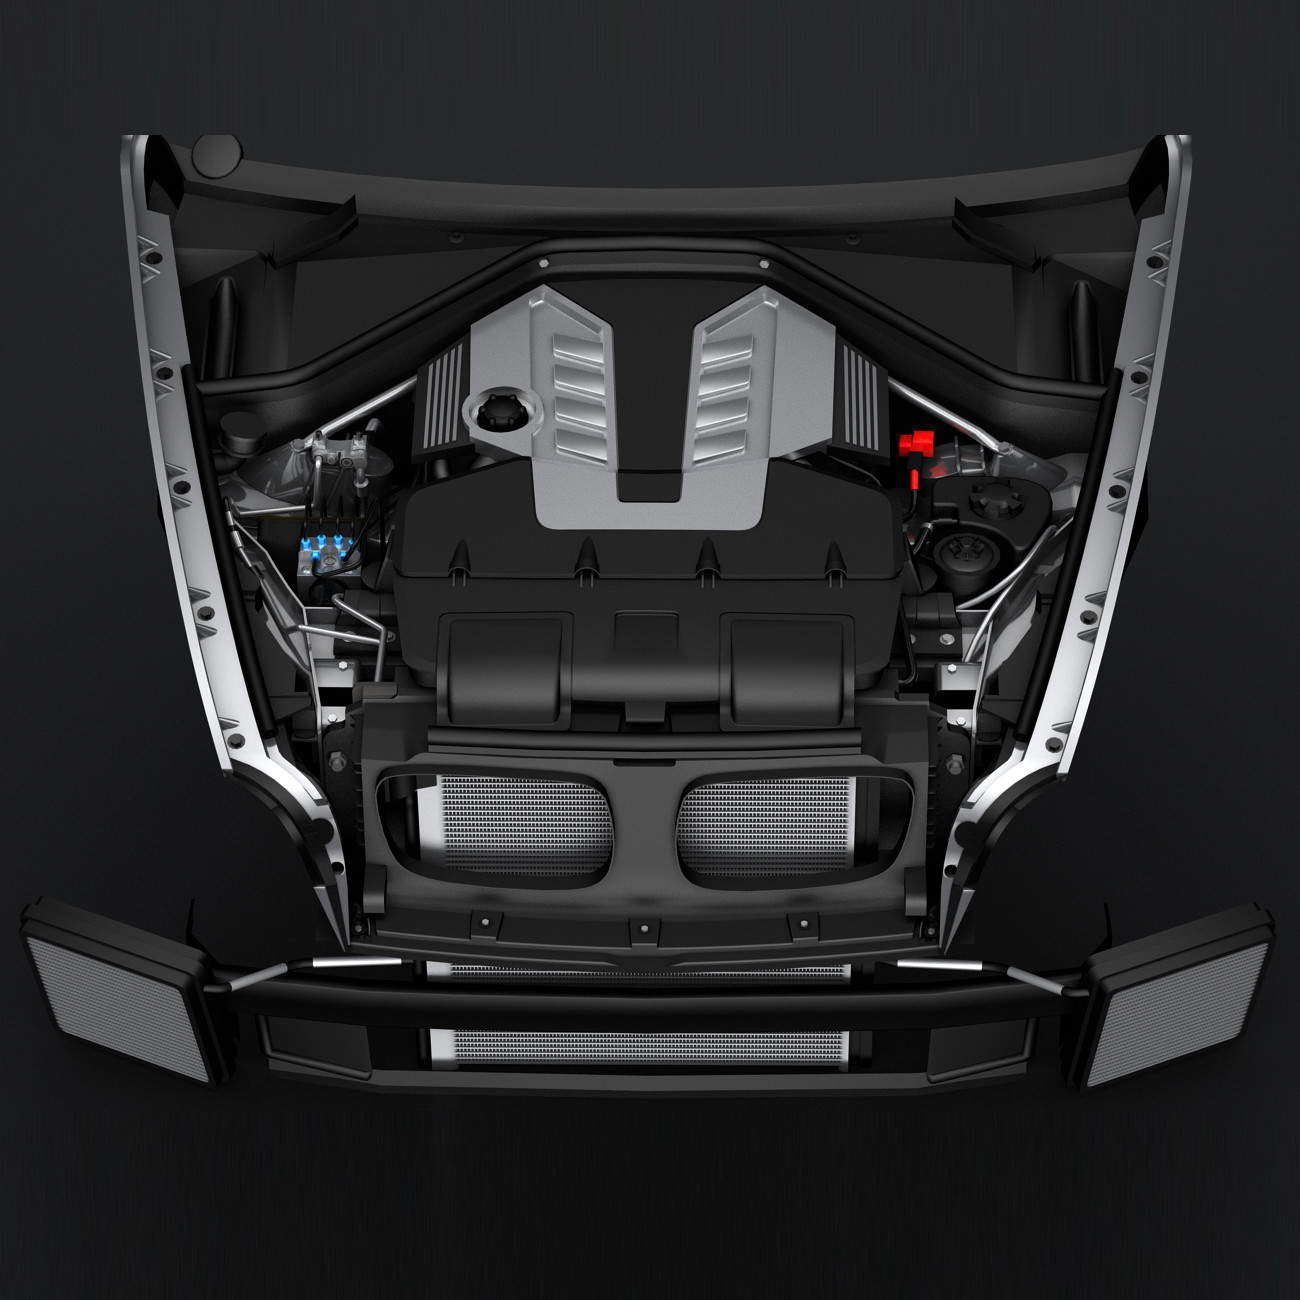 BMW_X5_X6_V8_Engine_1.jpg